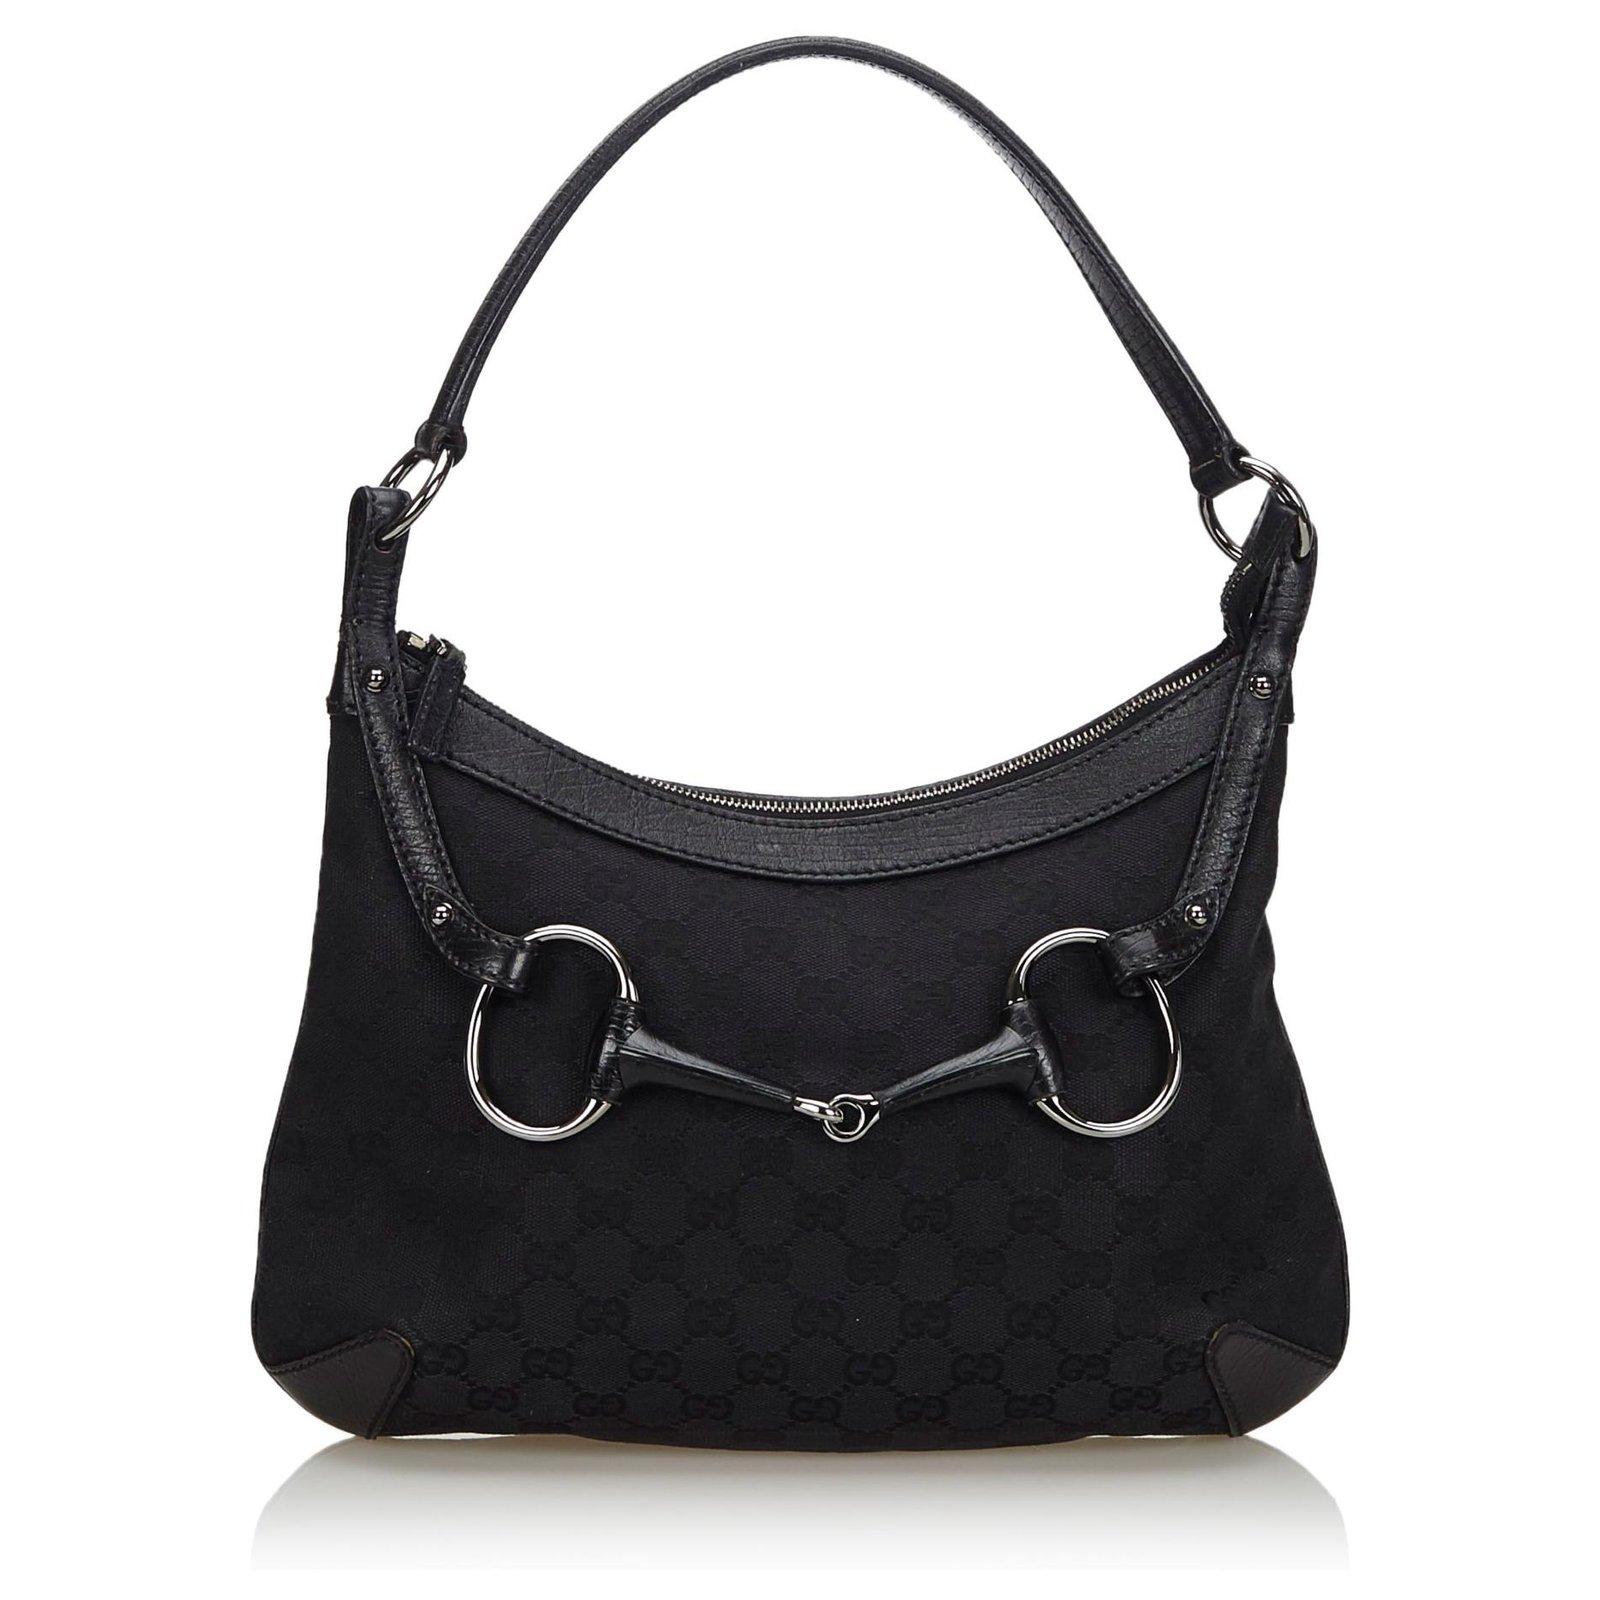 e811d9852 Gucci Gucci Black GG Canvas Horsebit Hobo Bag Handbags Leather,Other ,Cloth,Cloth